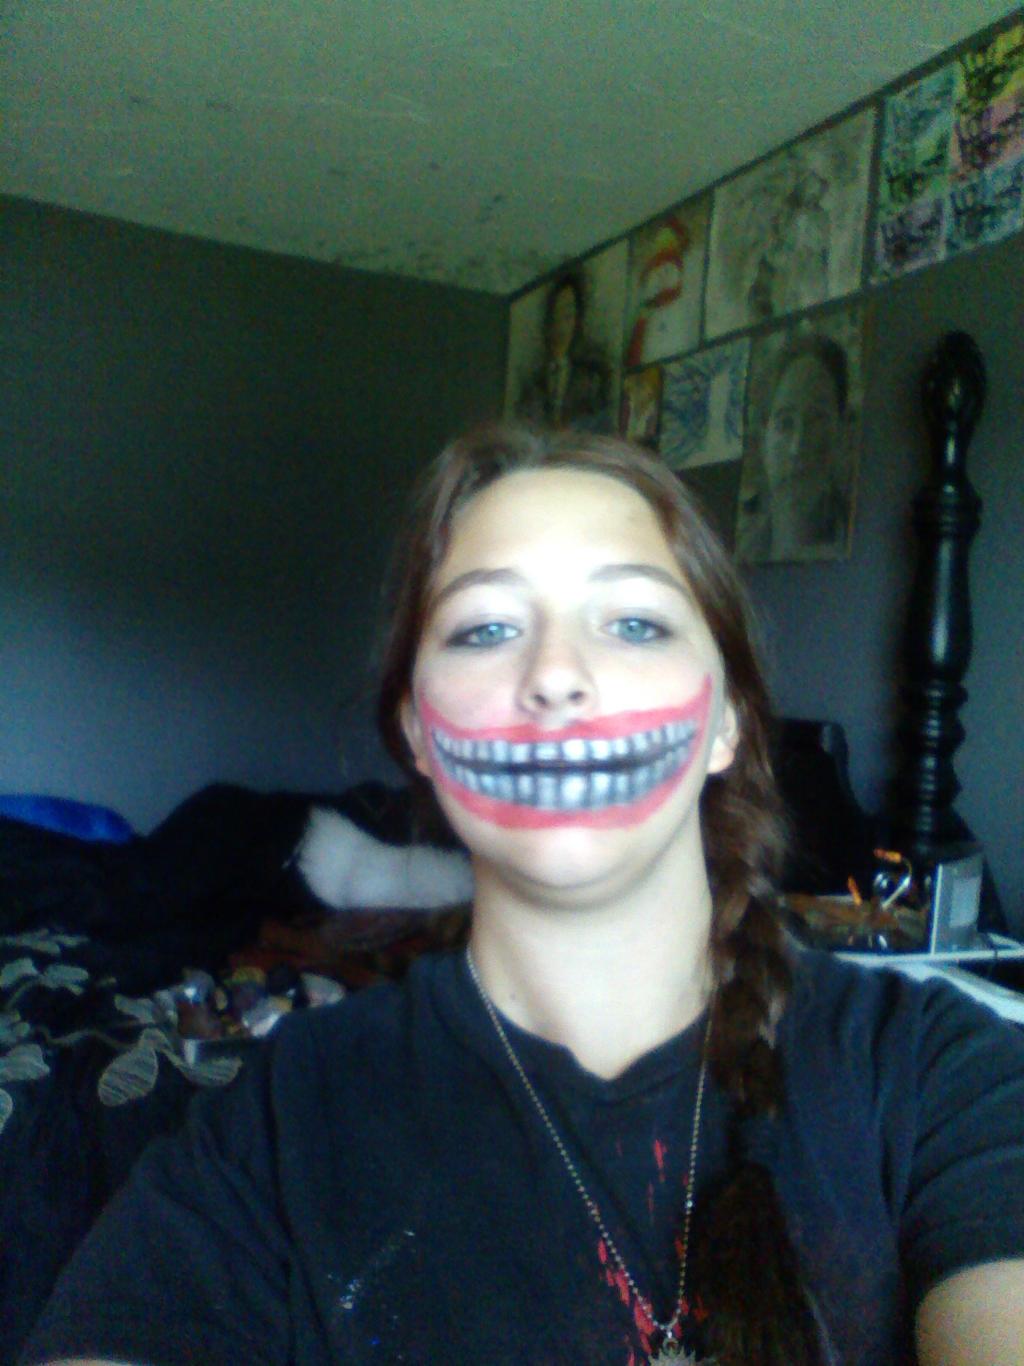 Large Smile Halloween Makeup by Daylighter123 on DeviantArt